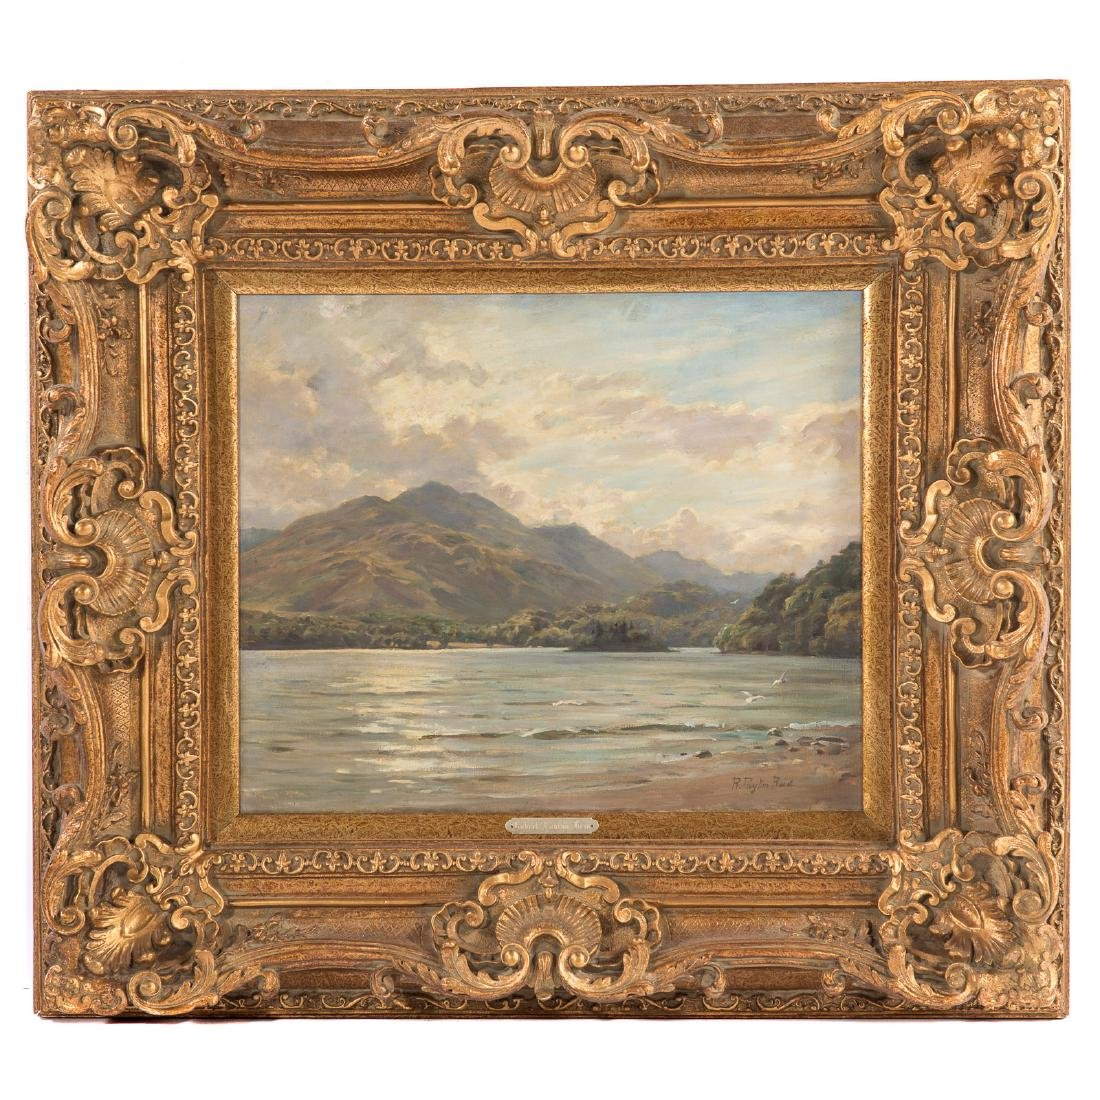 Robert Payton Reid. Landscape with Lake, oil